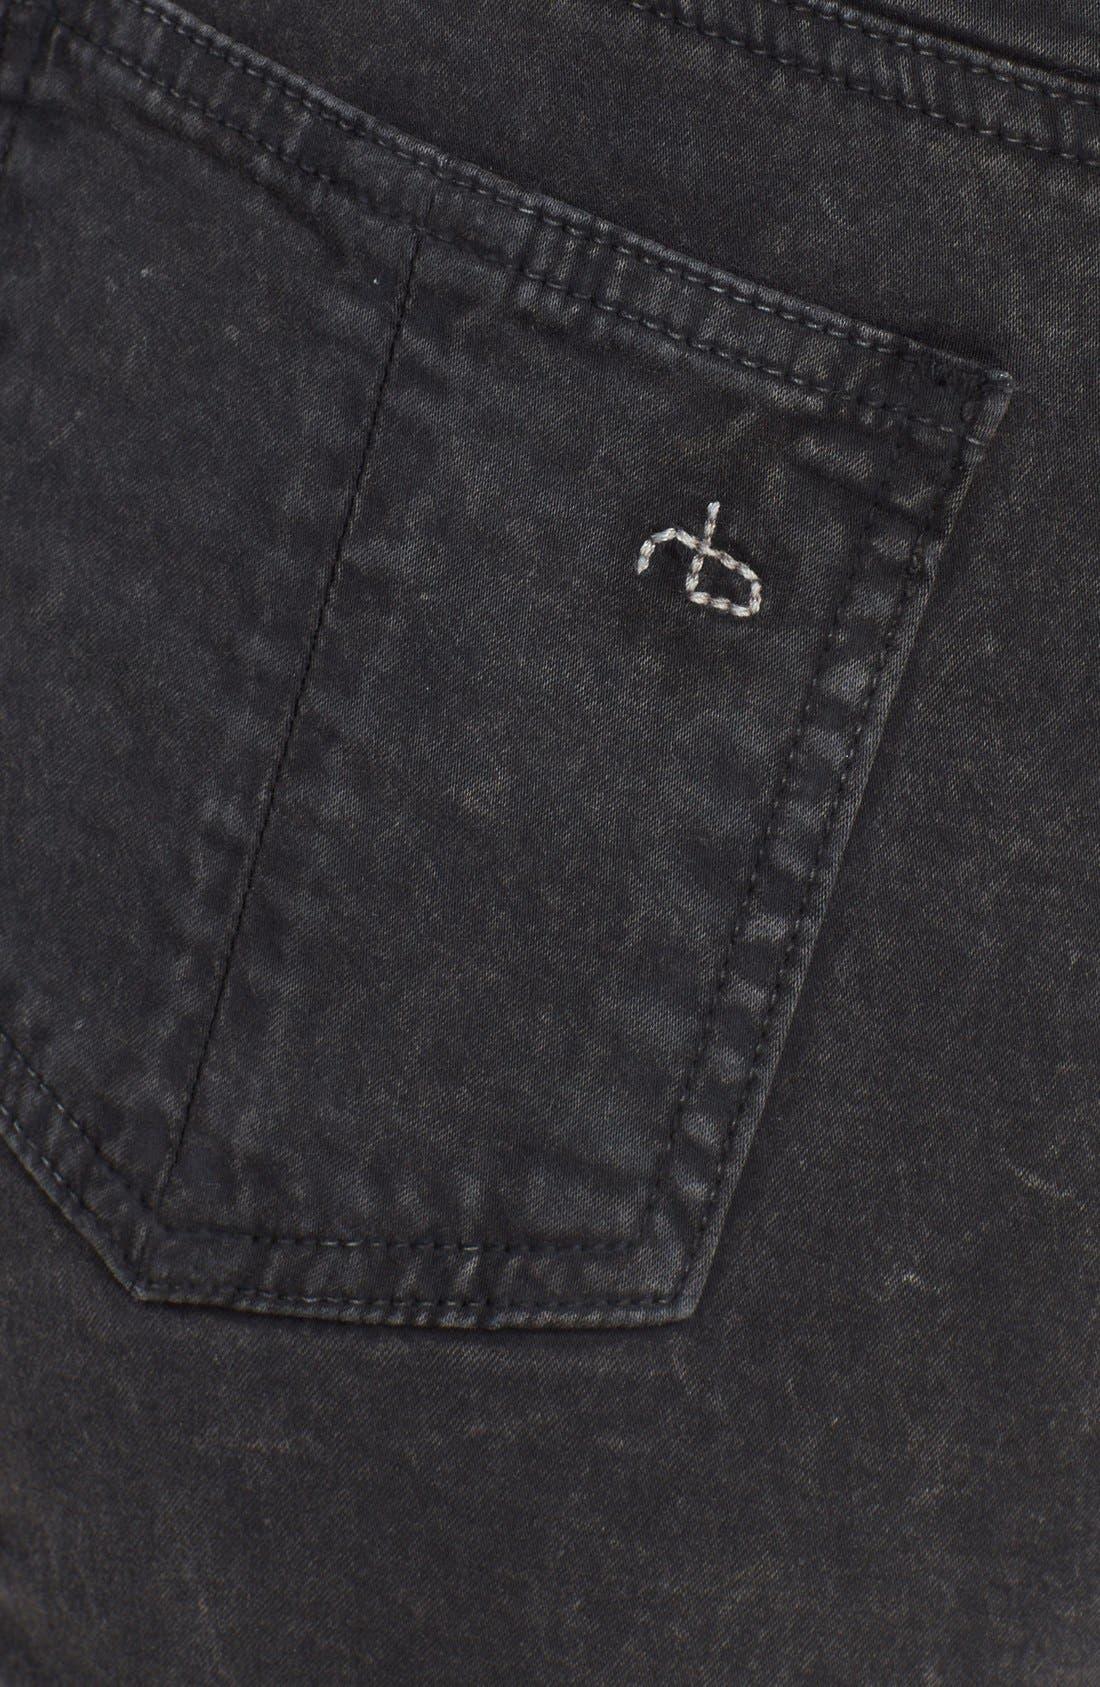 Alternate Image 3  - rag & bone/JEAN 'Justine' High Rise Skinny Jeans (Rosebowl Black)